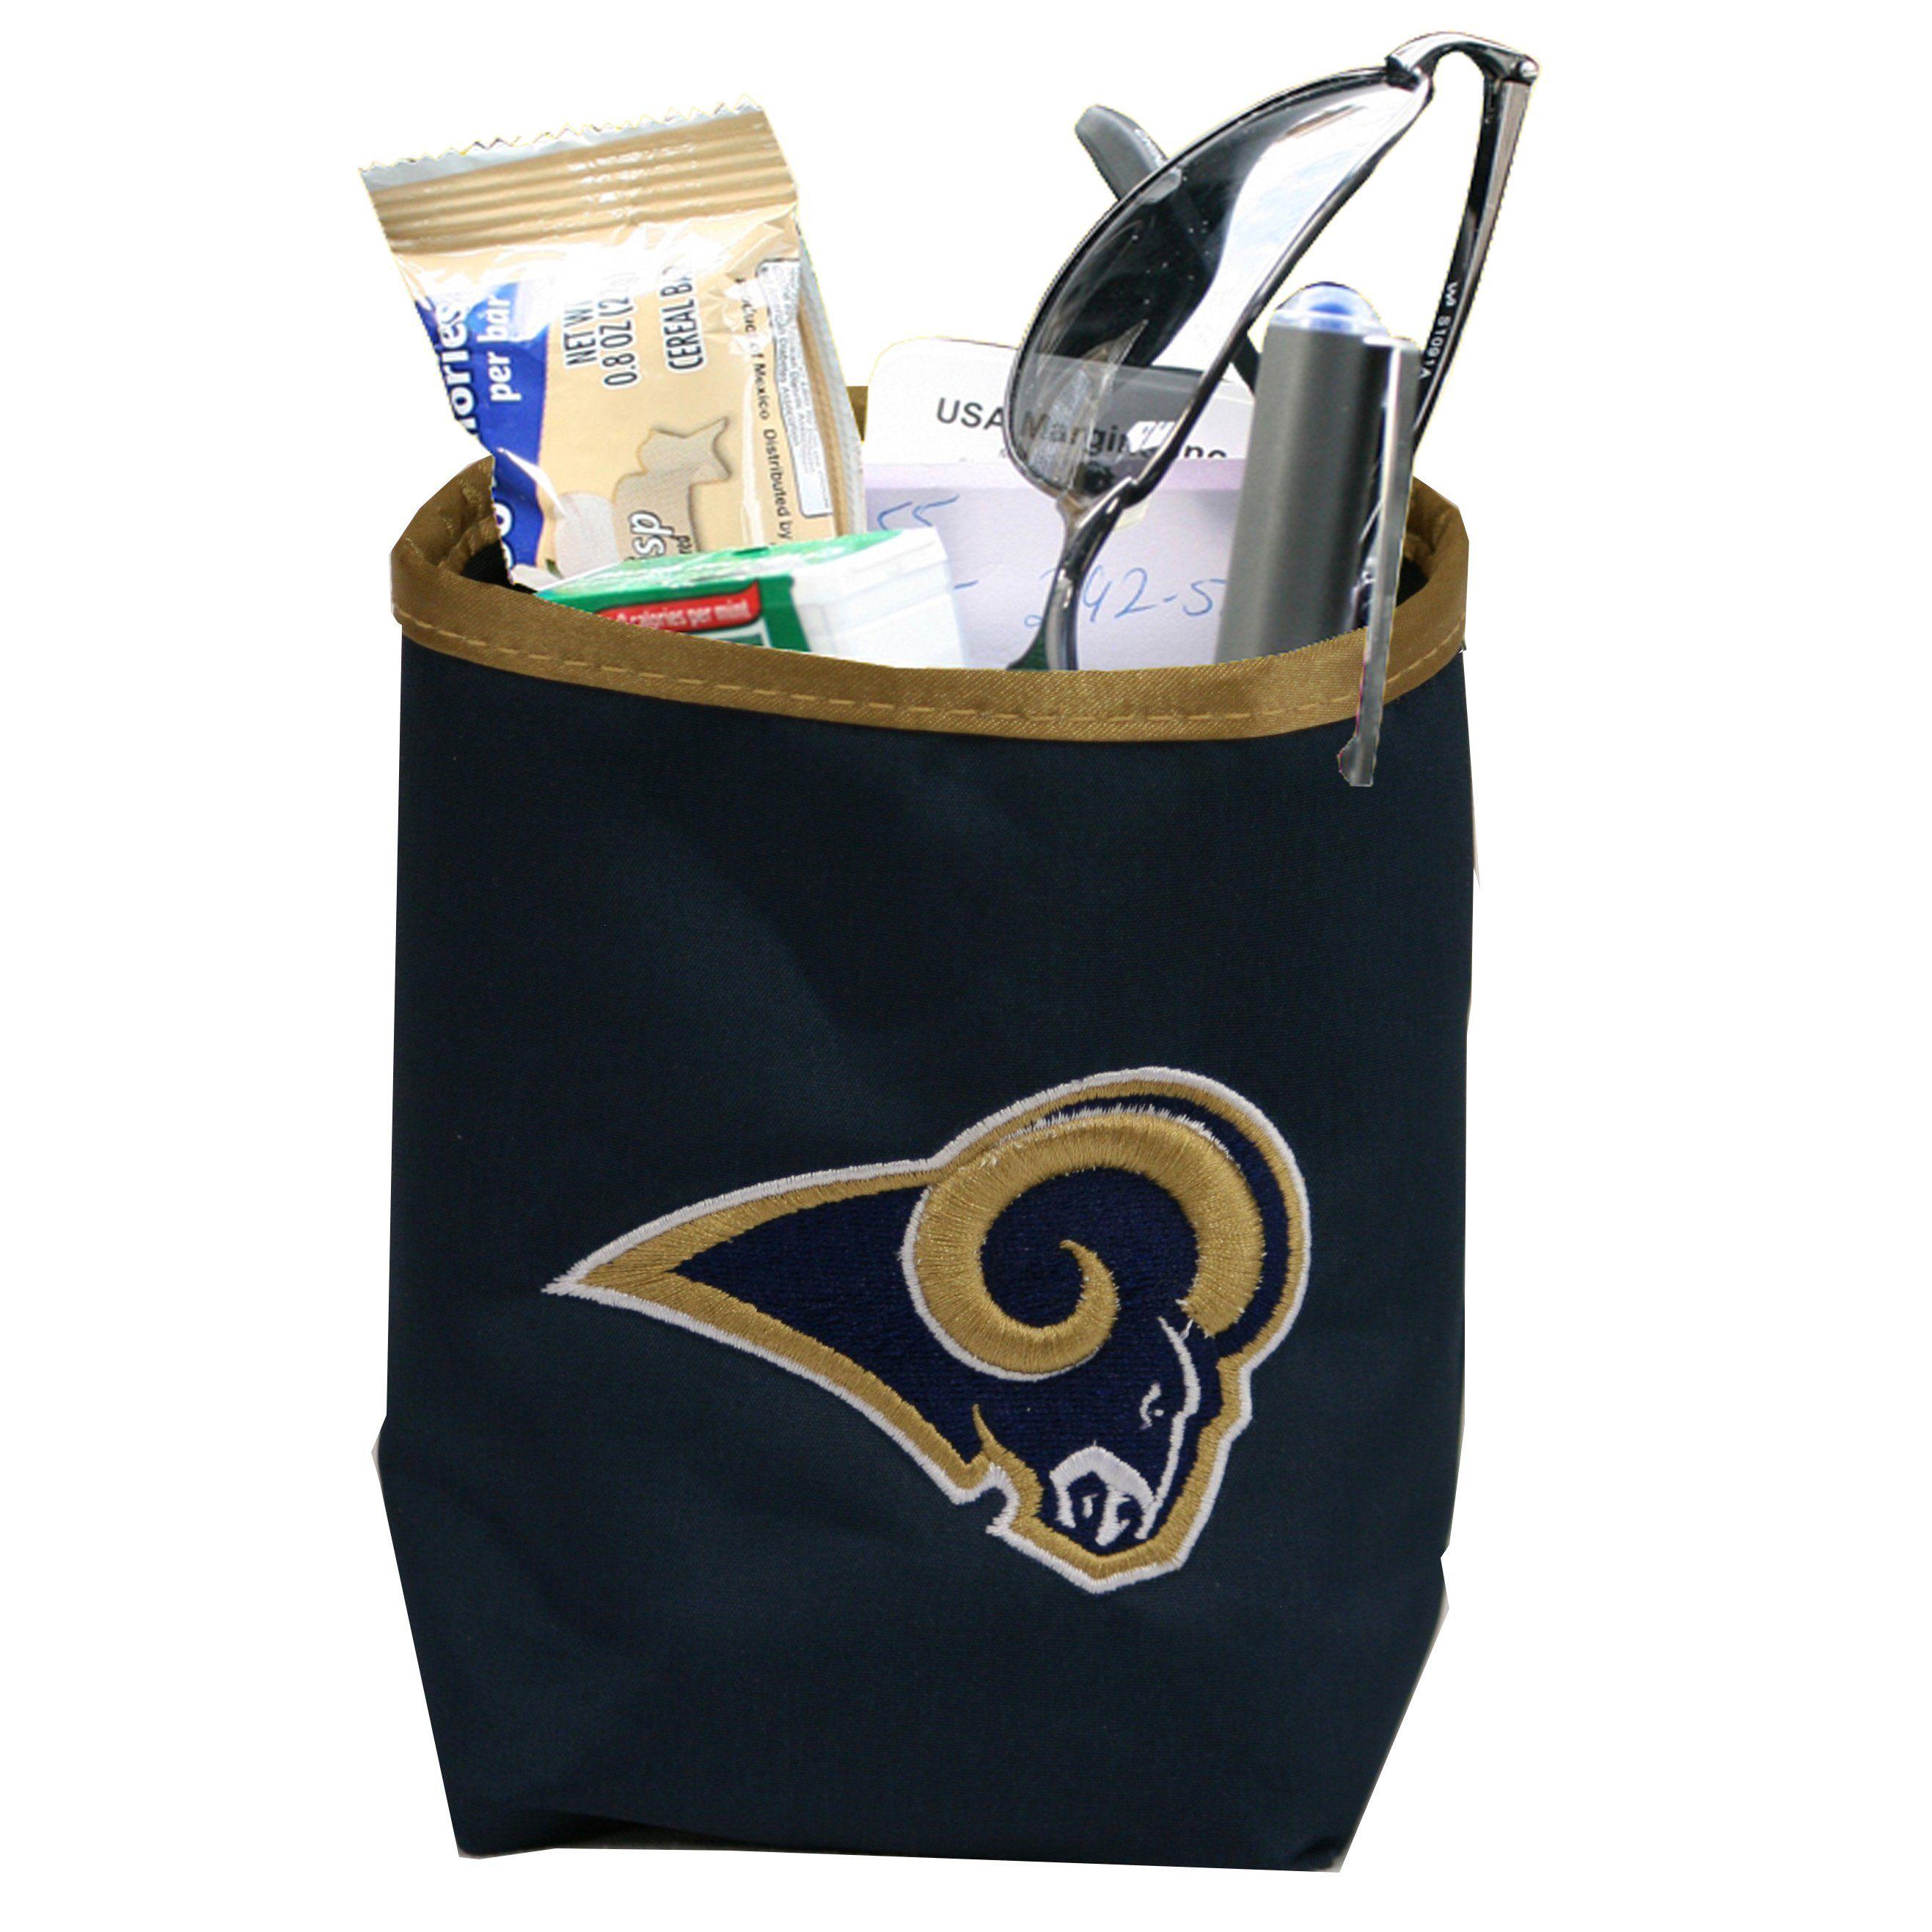 NFL Car Vent Pocket Organizers Pocket organizer, Car